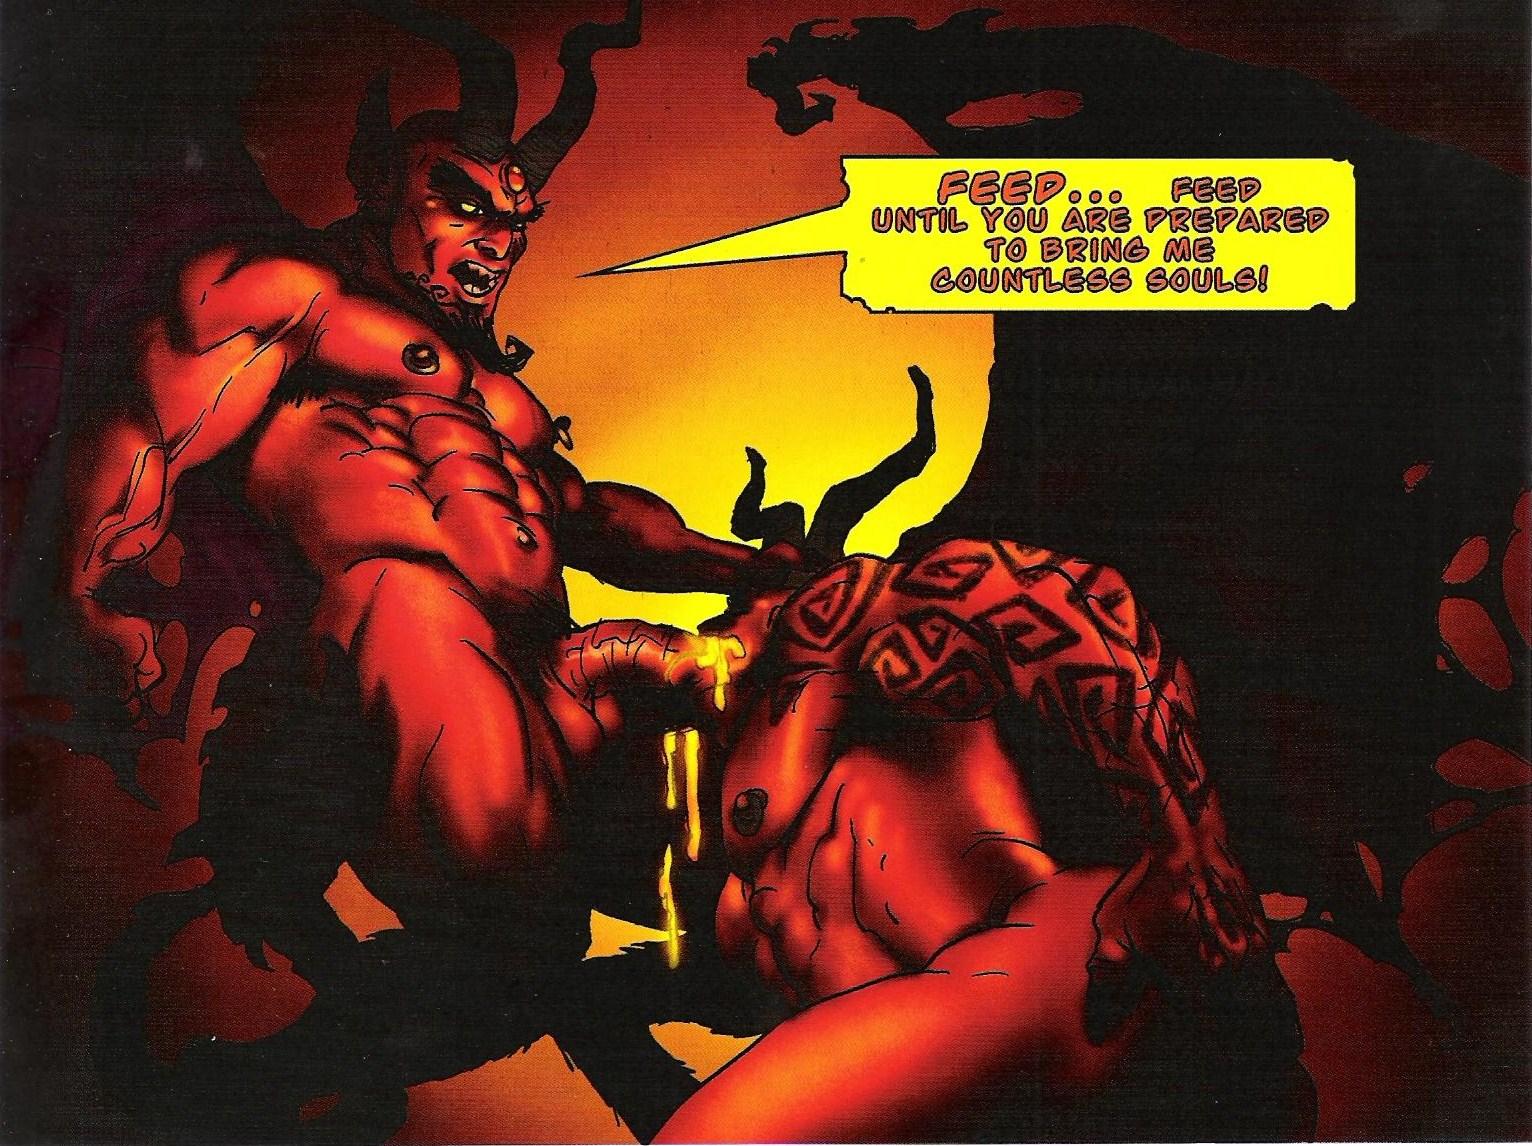 Demonic sex comic think, that